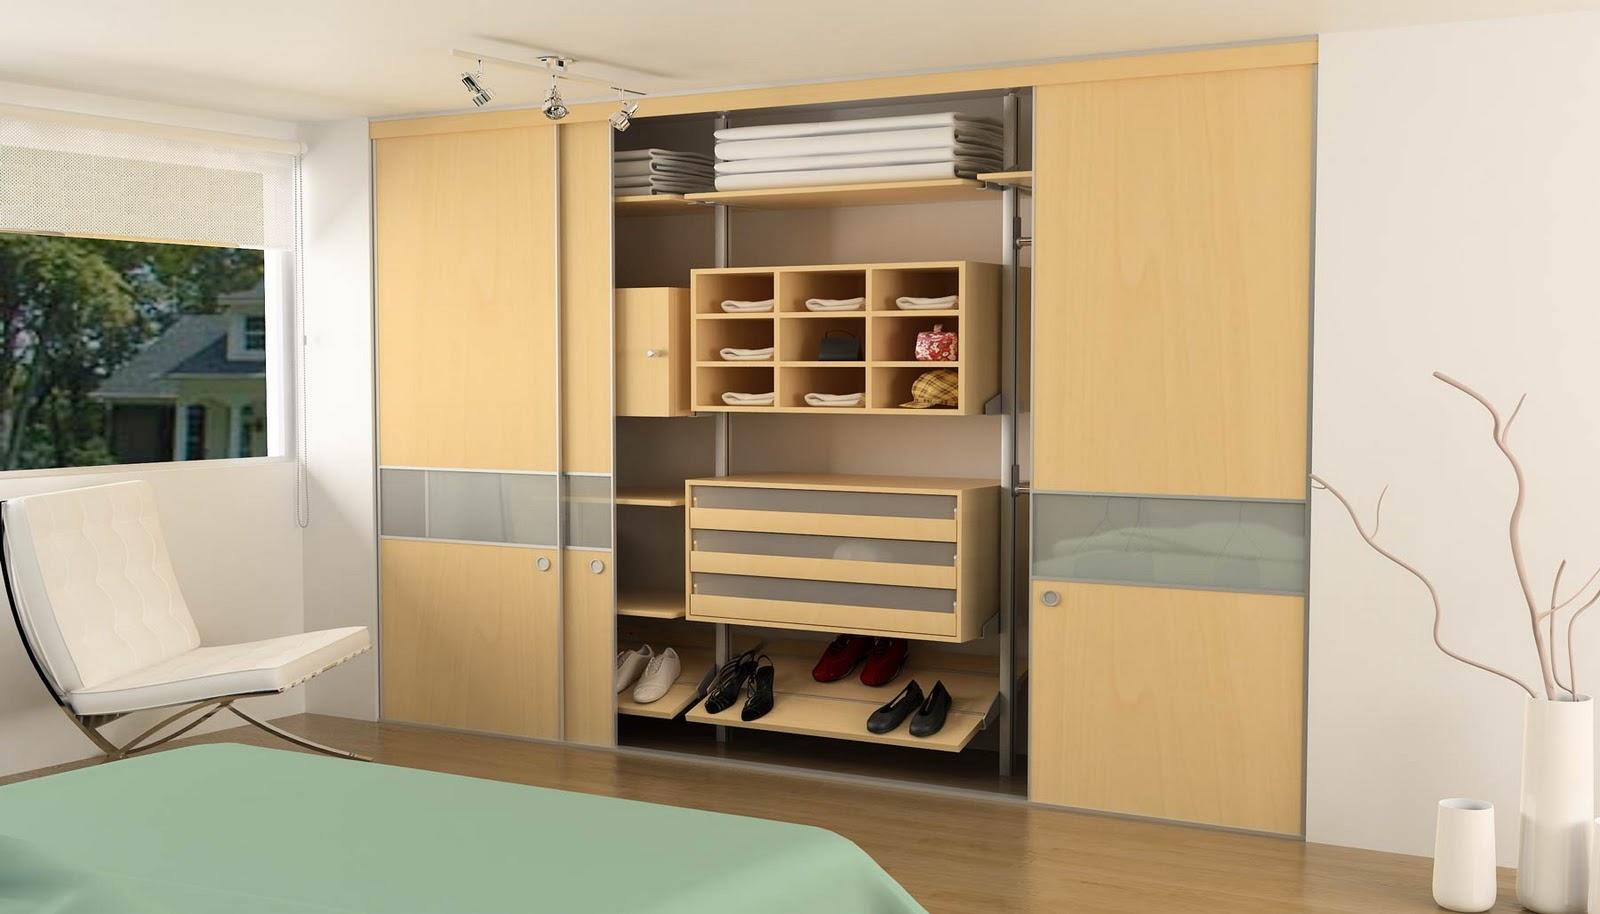 Orbis home closets modulares closets linea status for Modulares de cocina modernos